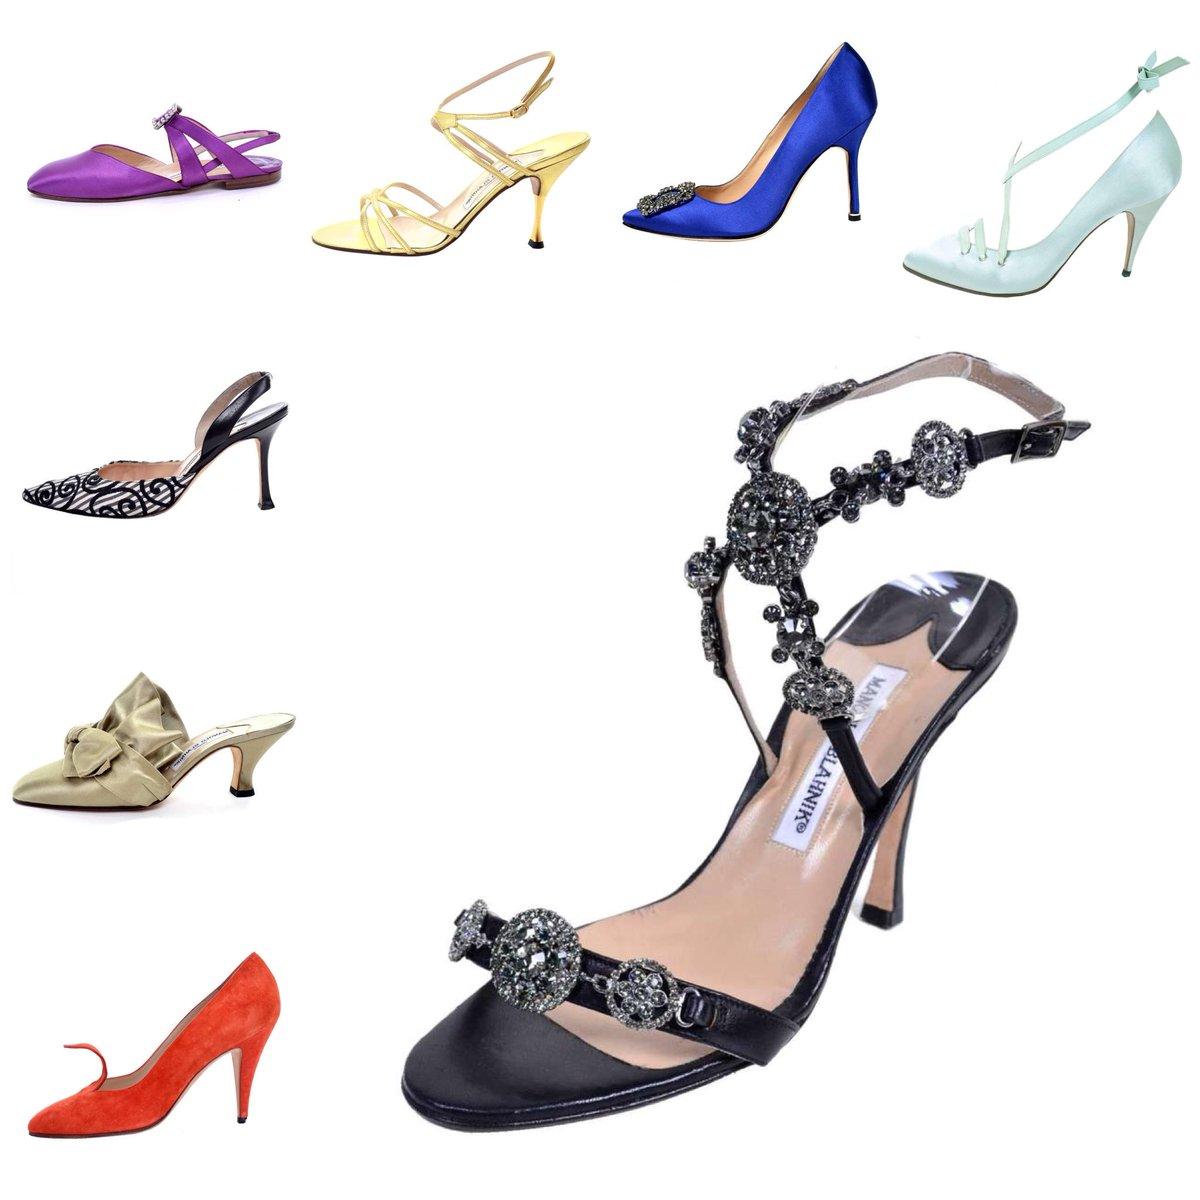 u201cmy shoes are special shoes for discerning feetu201d manolo blahnik shoes fashion vintage